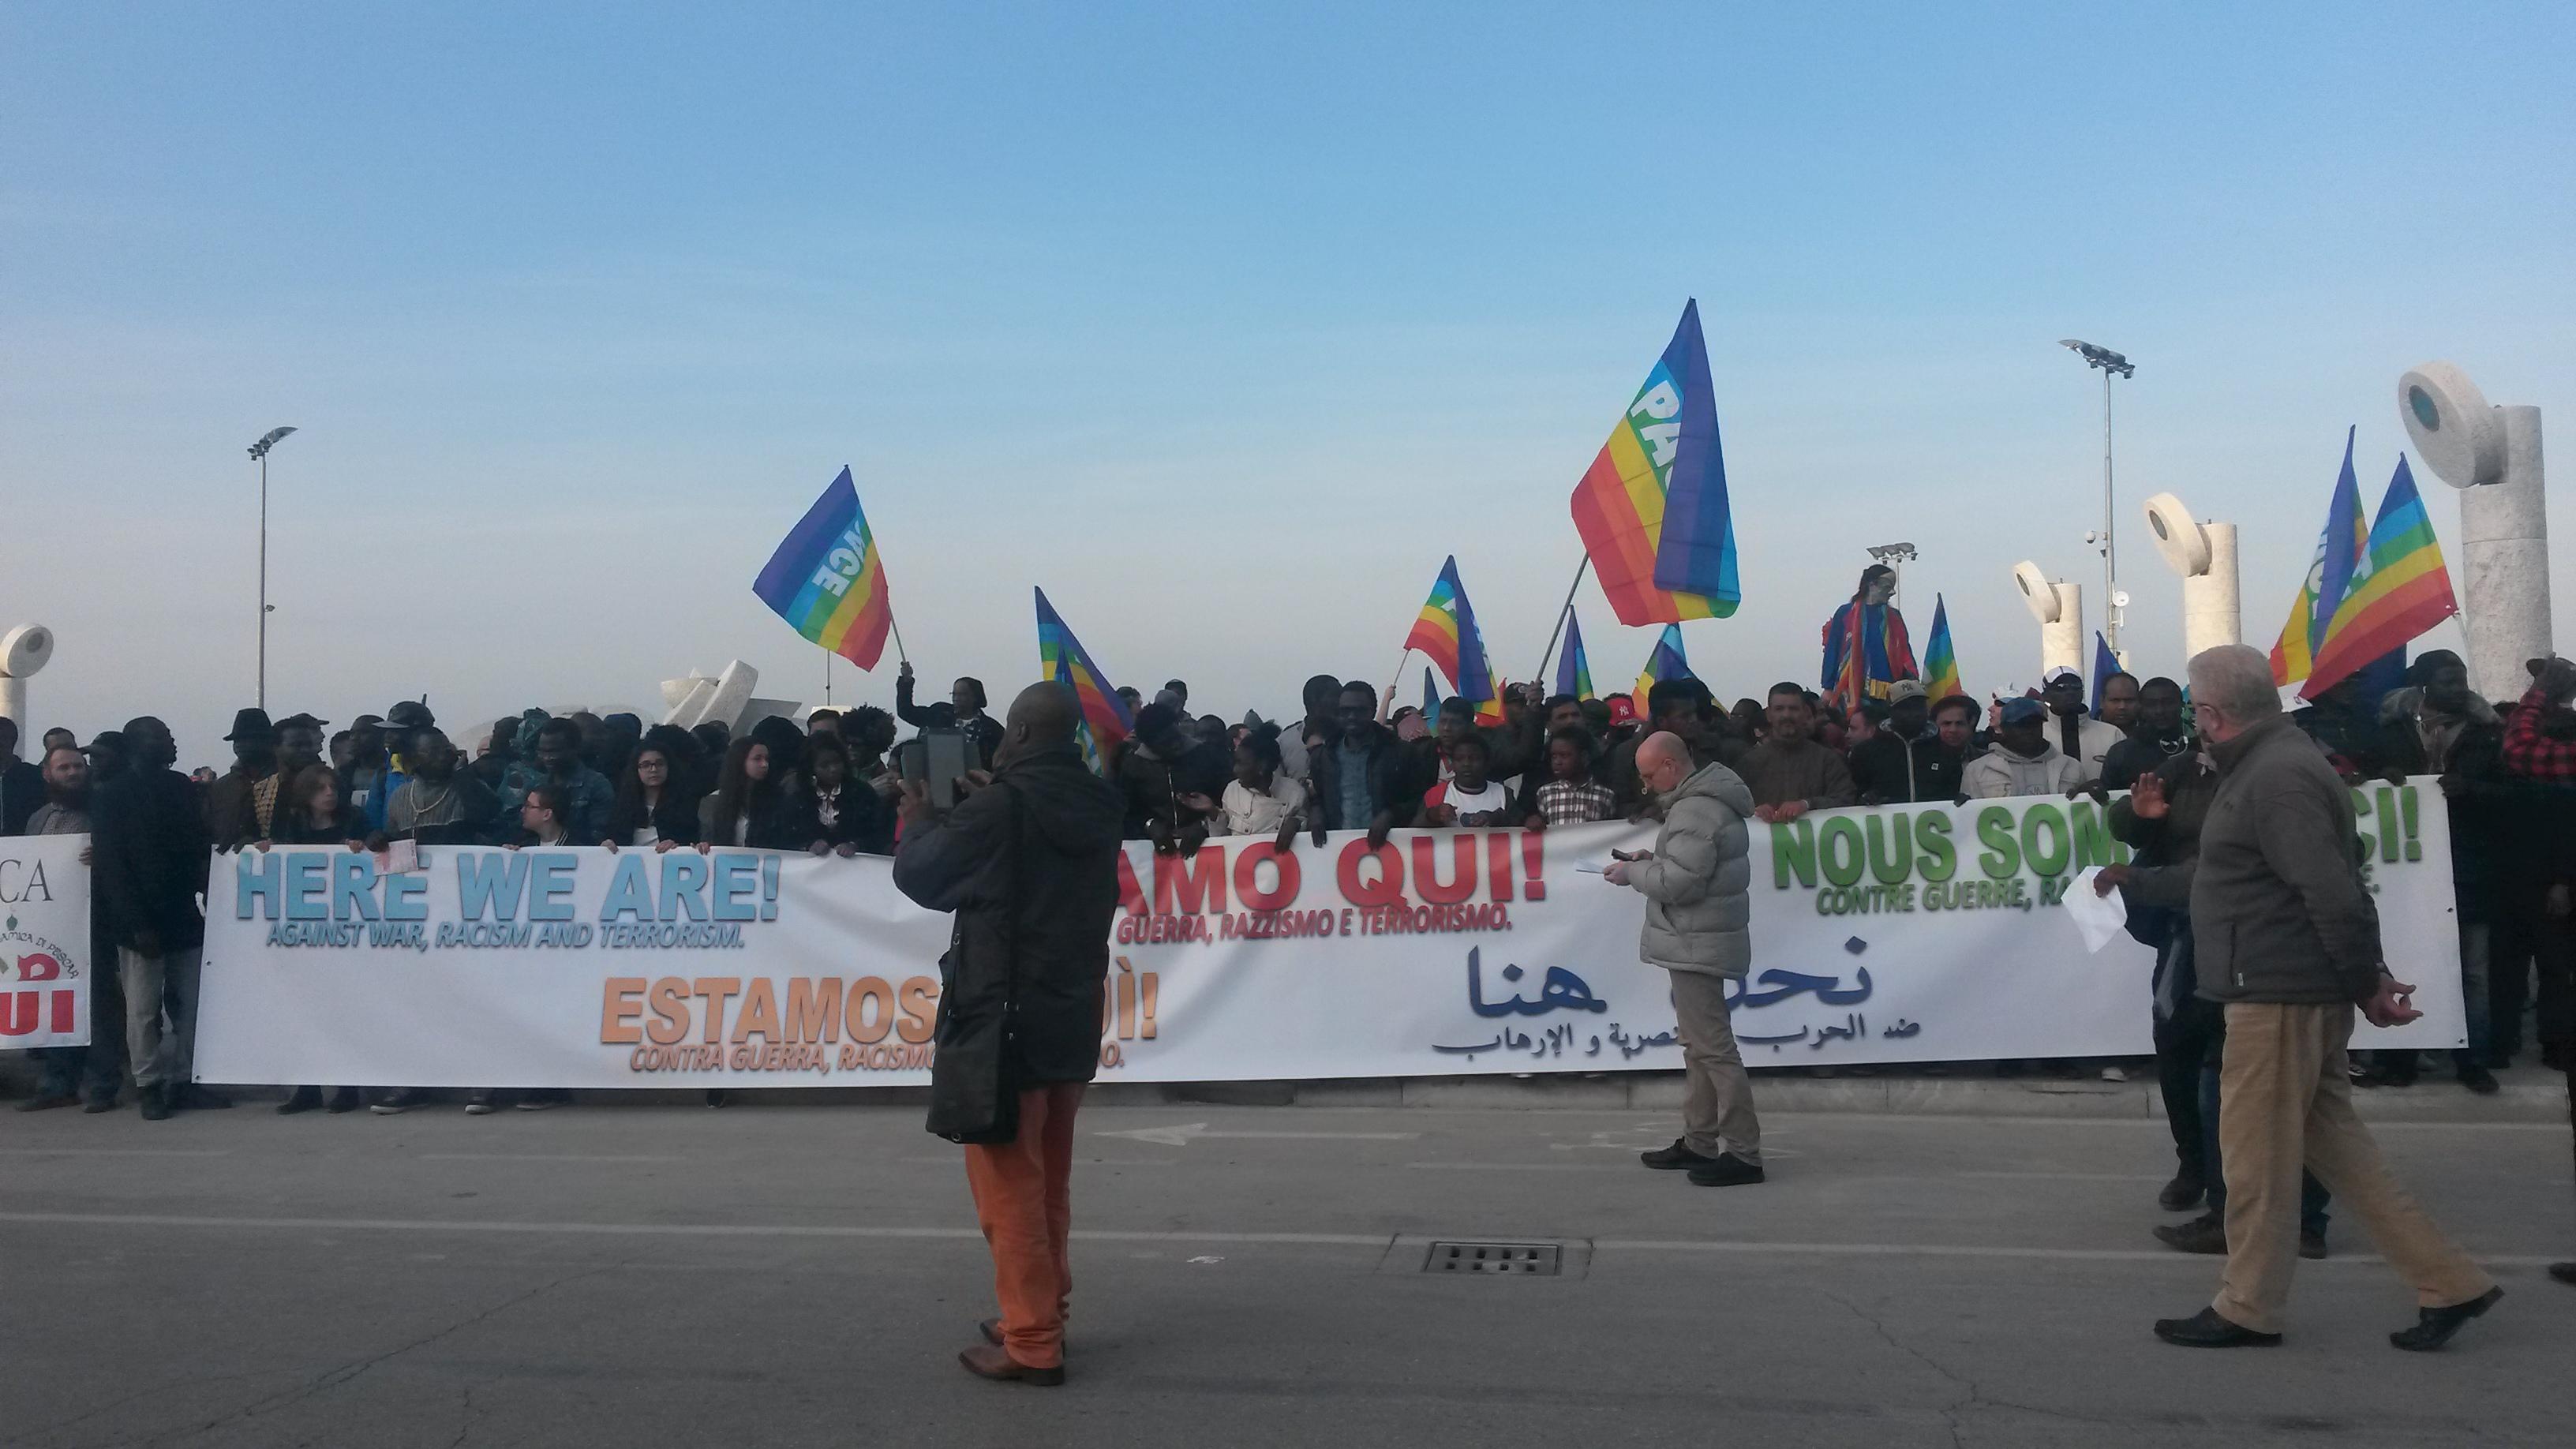 Pescara: in marcia contro guerra, razzismo, terrorismo (Video)